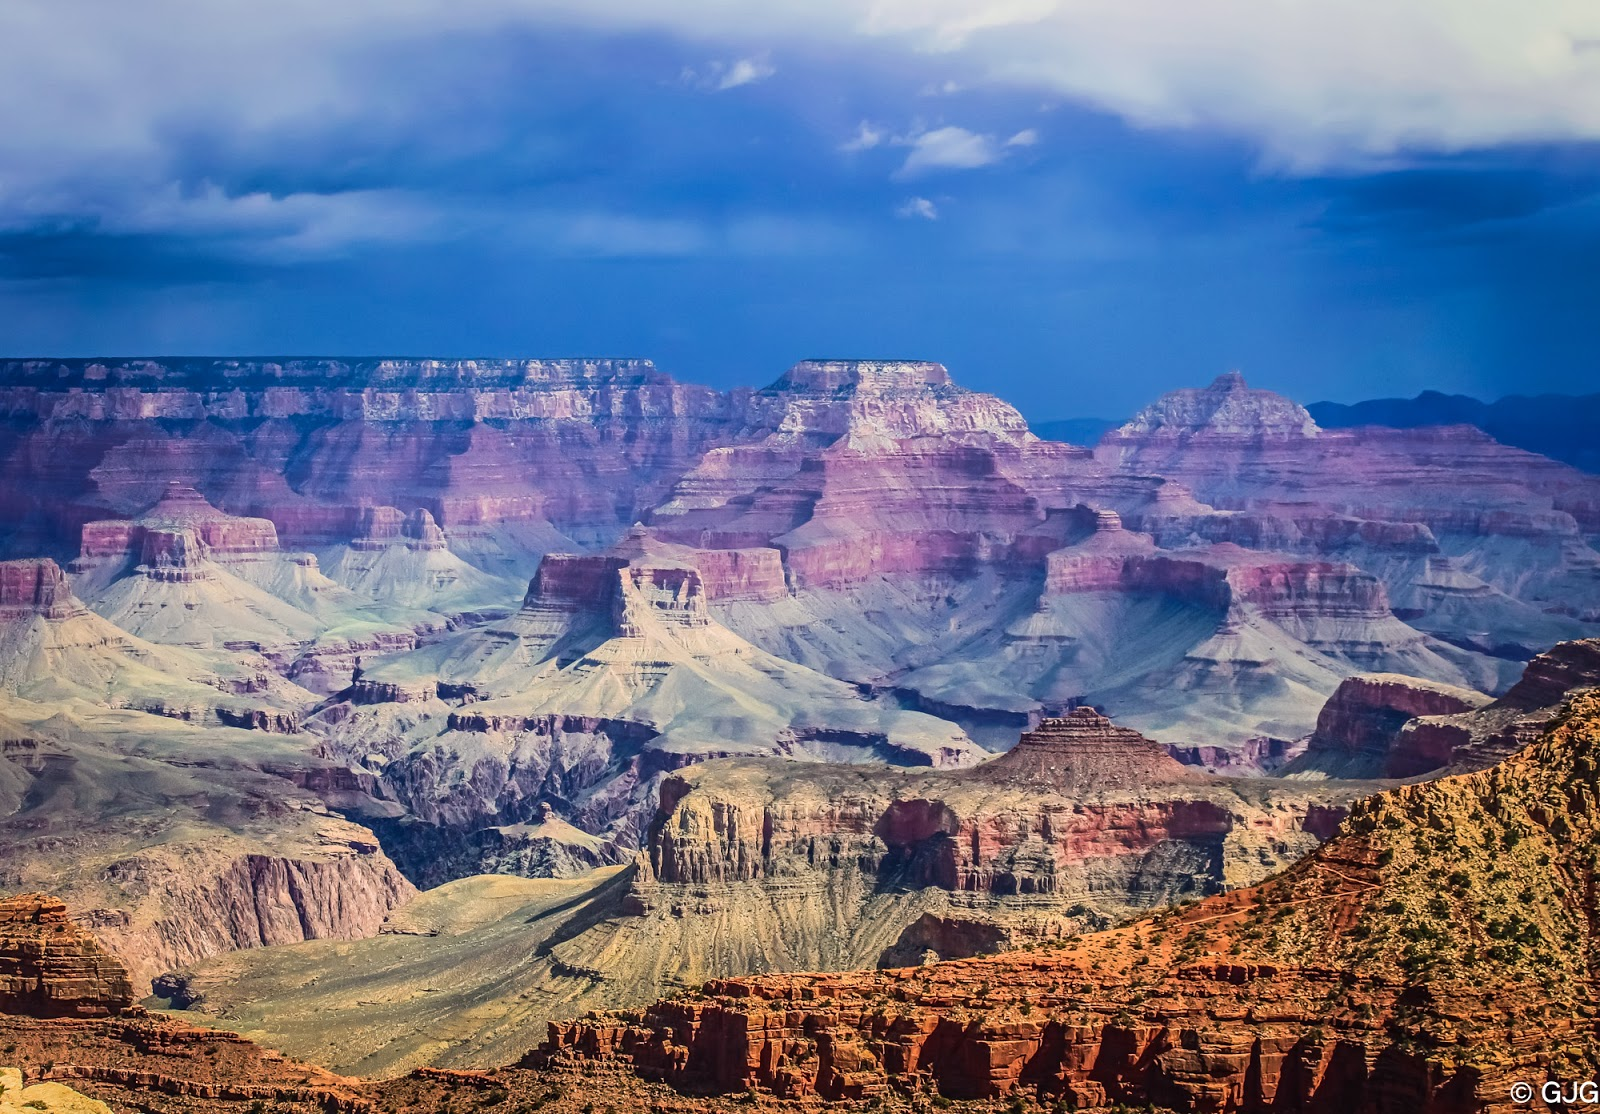 Nevada-Arizona-Utah: A USA Road Trip Travel Itinerary